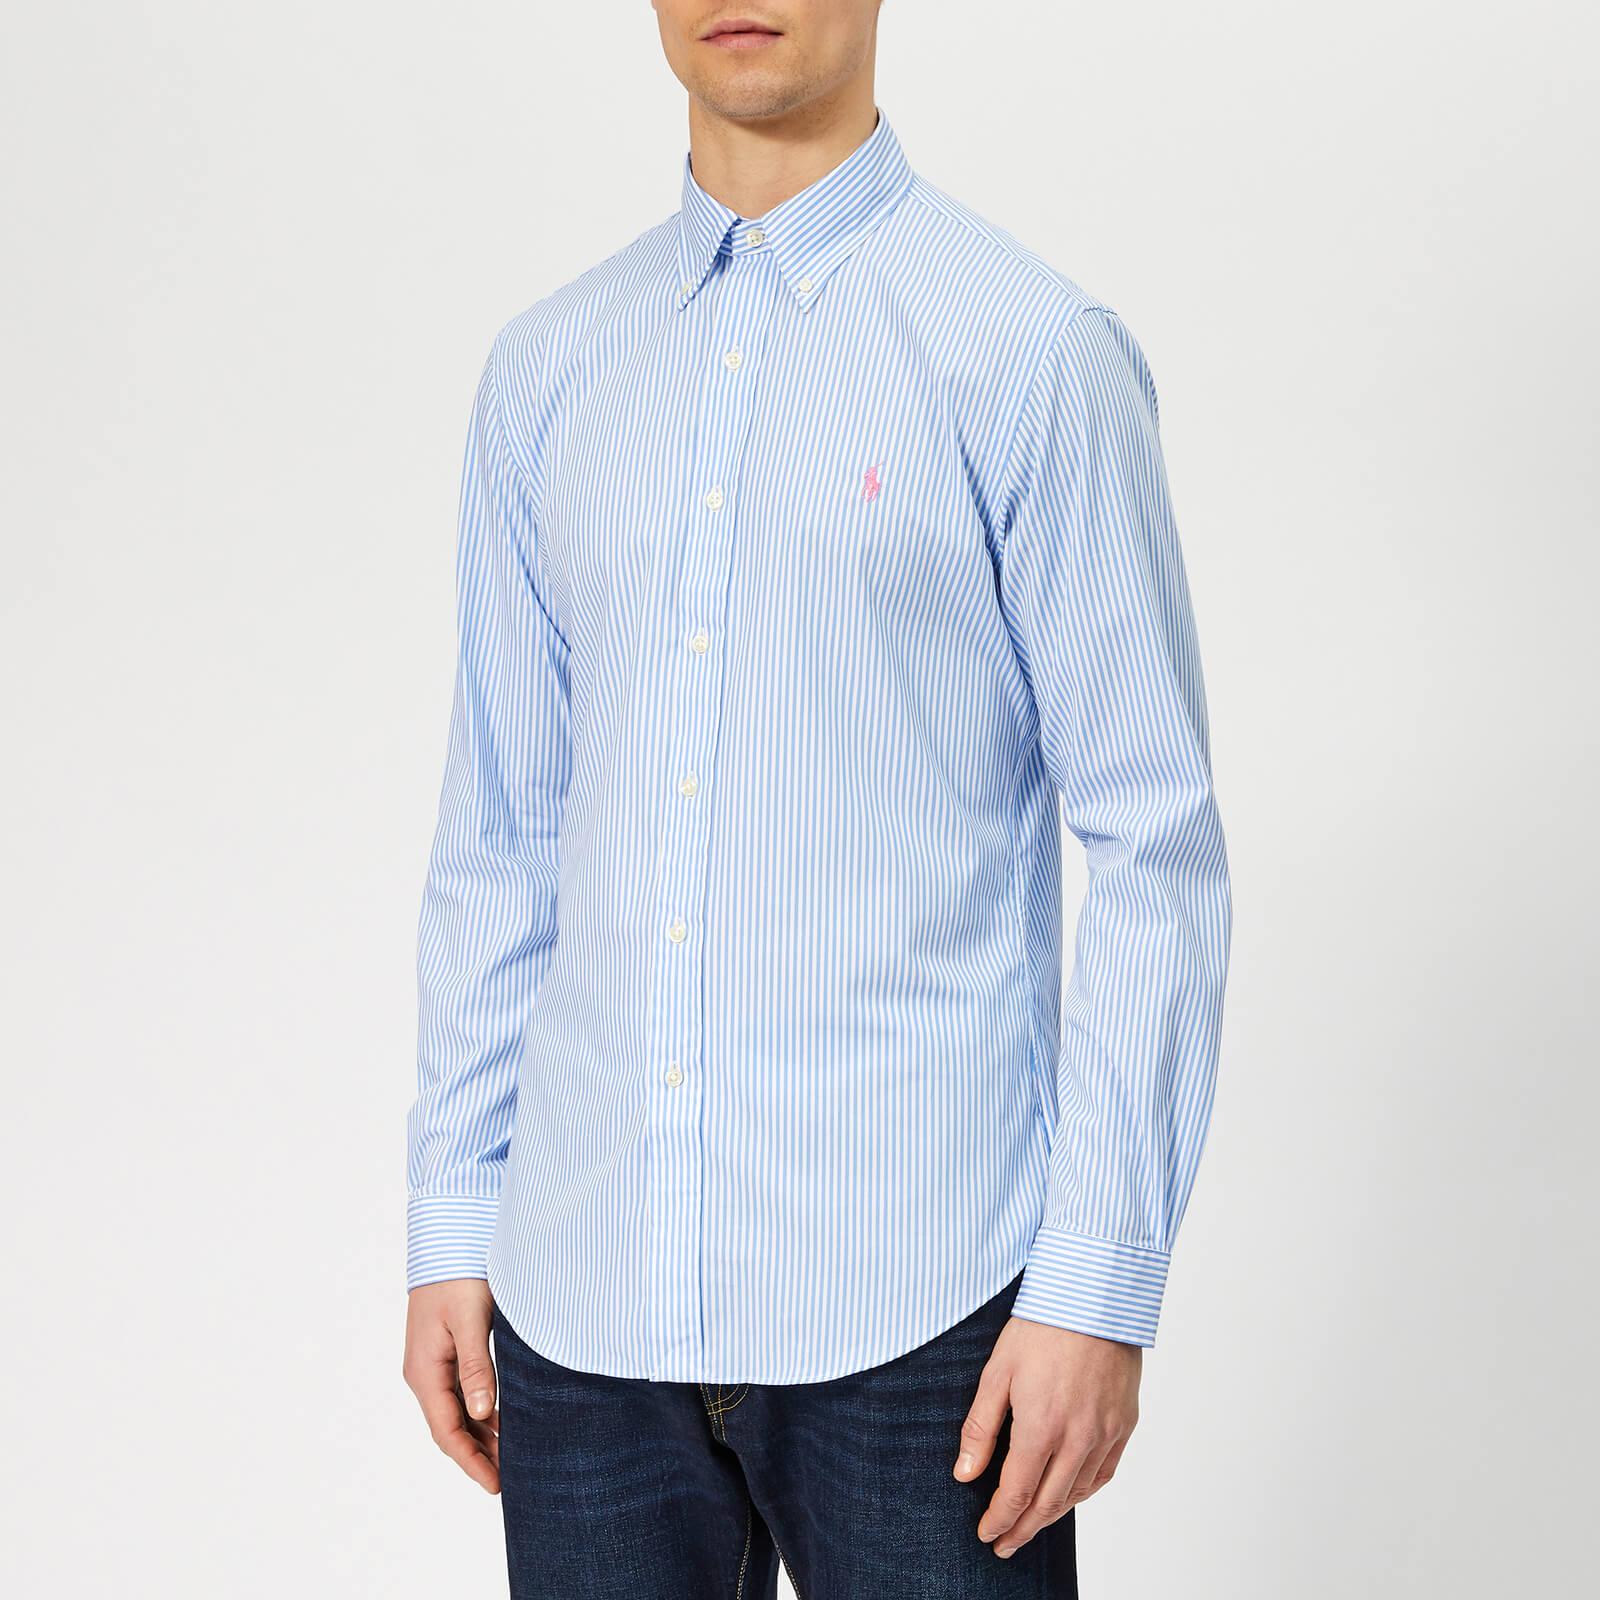 c47ba8409f Polo Ralph Lauren Men's Slim Fit Stretch Poplin Shirt - Powder Blue - Free  UK Delivery over £50